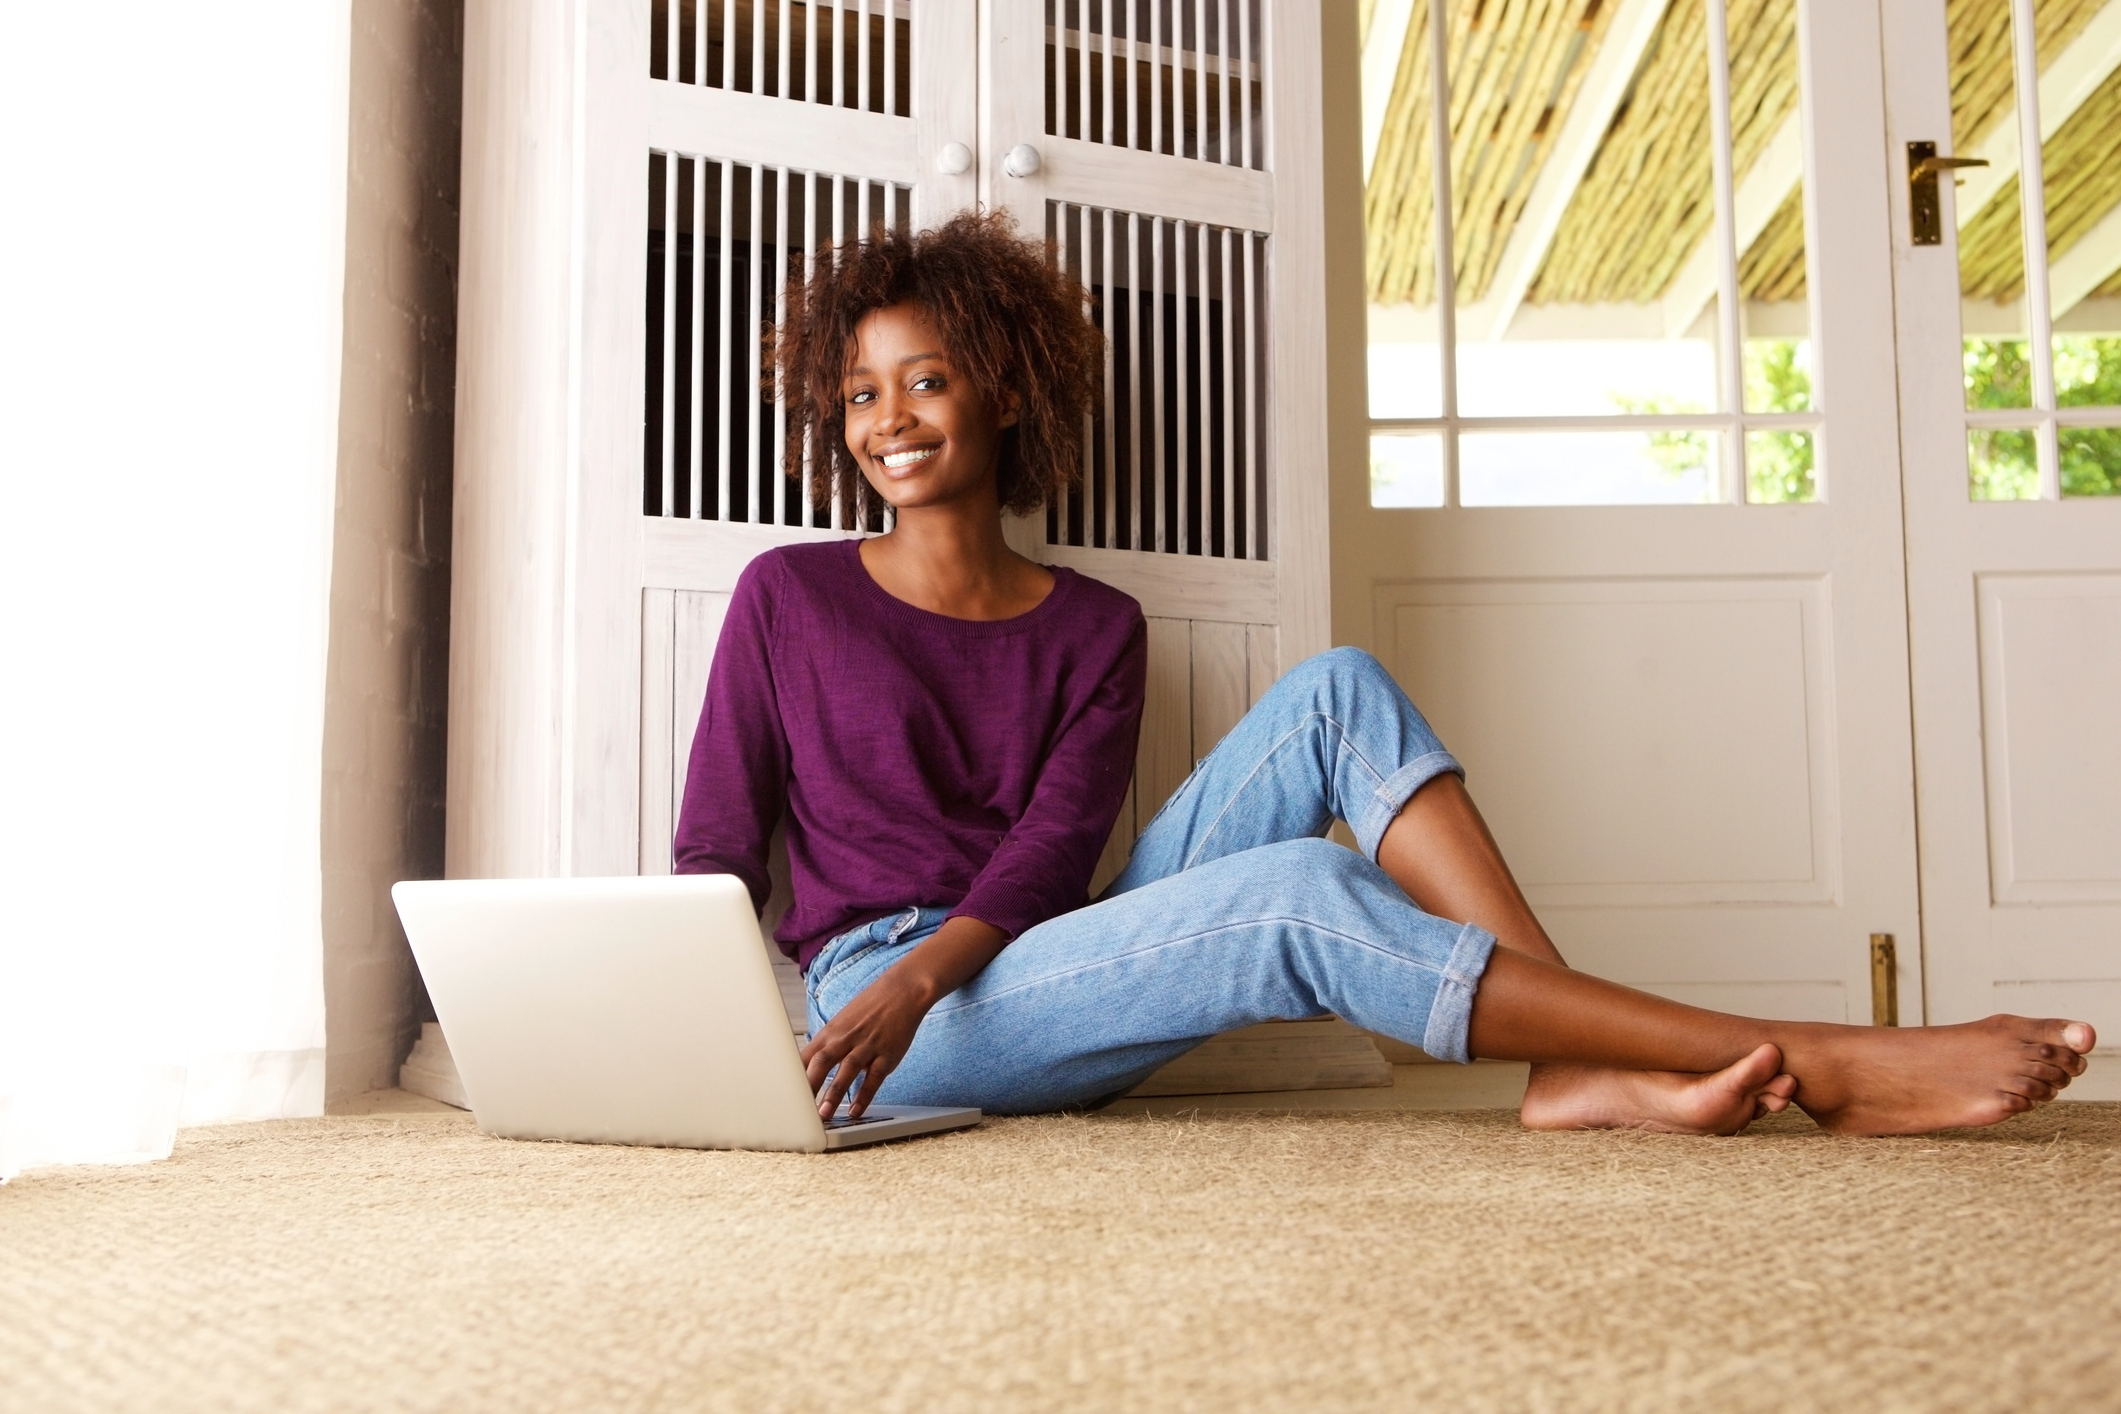 rentredi vs appfolio hero image: Smiling black woman sitting with laptop at home